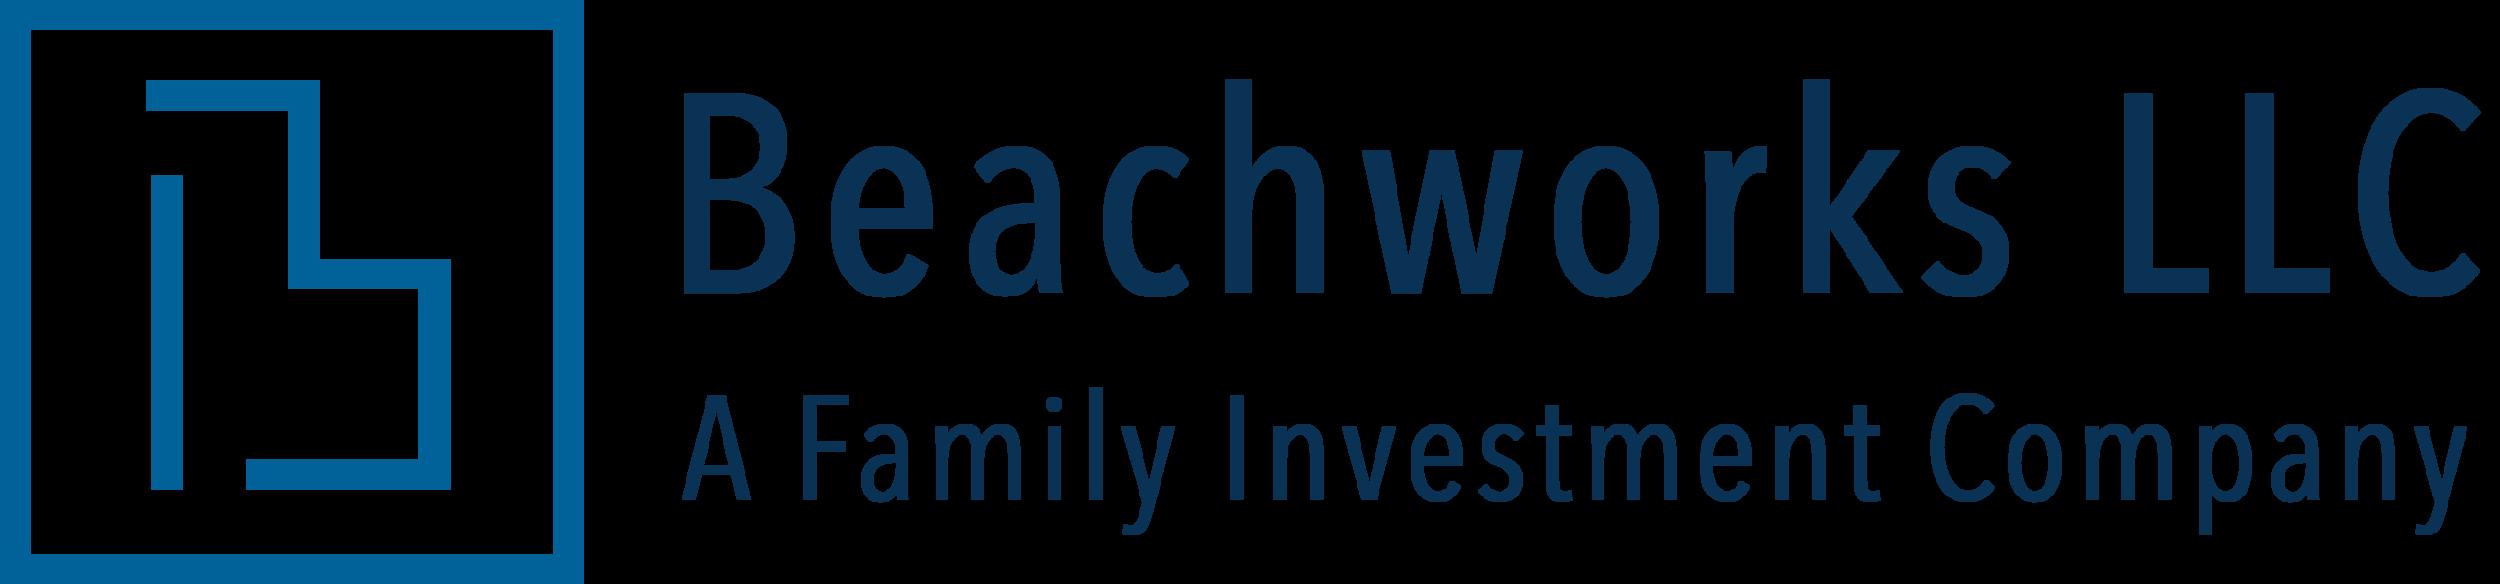 Beachworks-logo.png